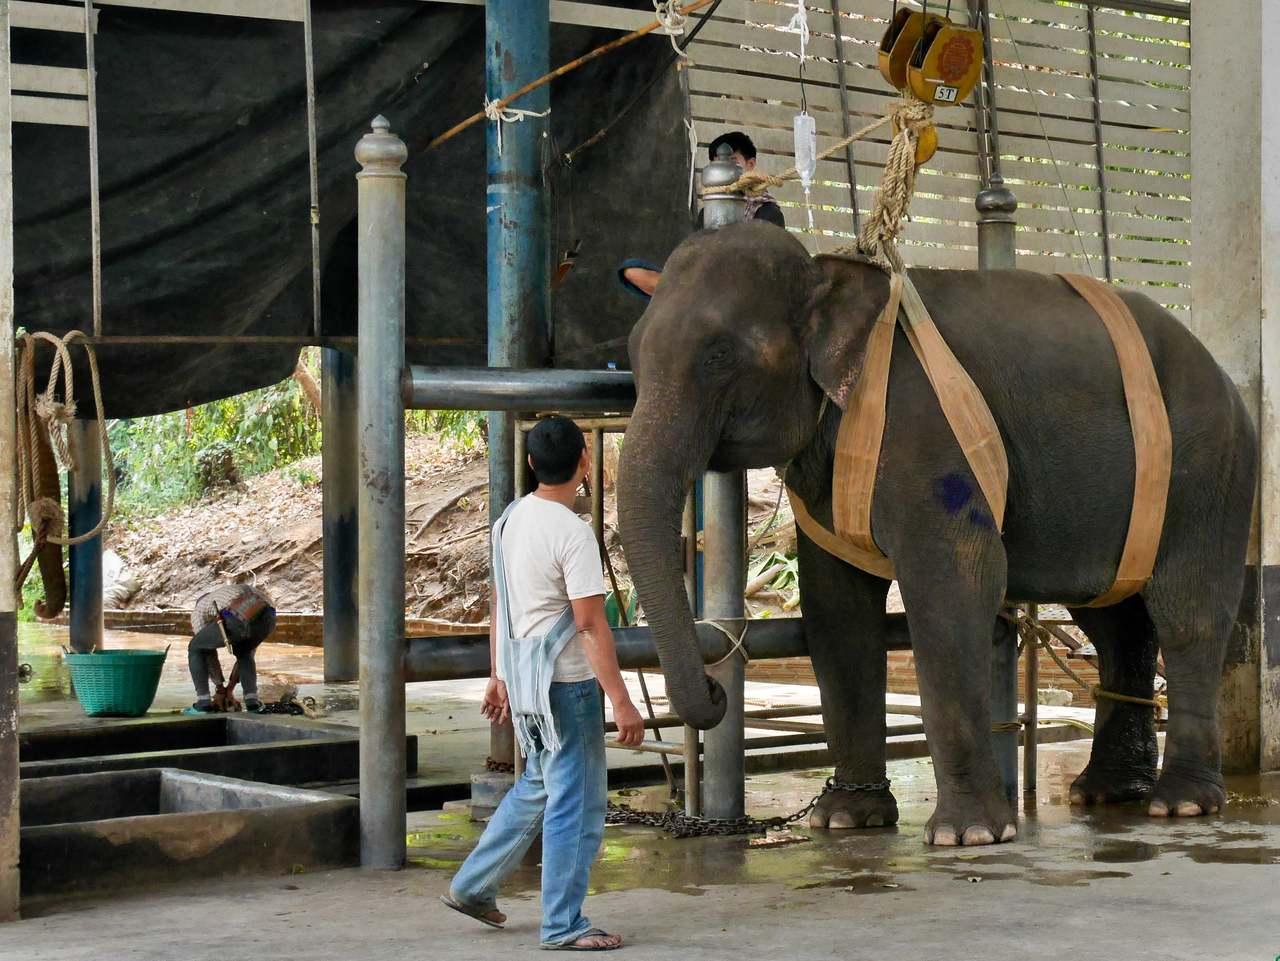 Elephant in Lapang hospital